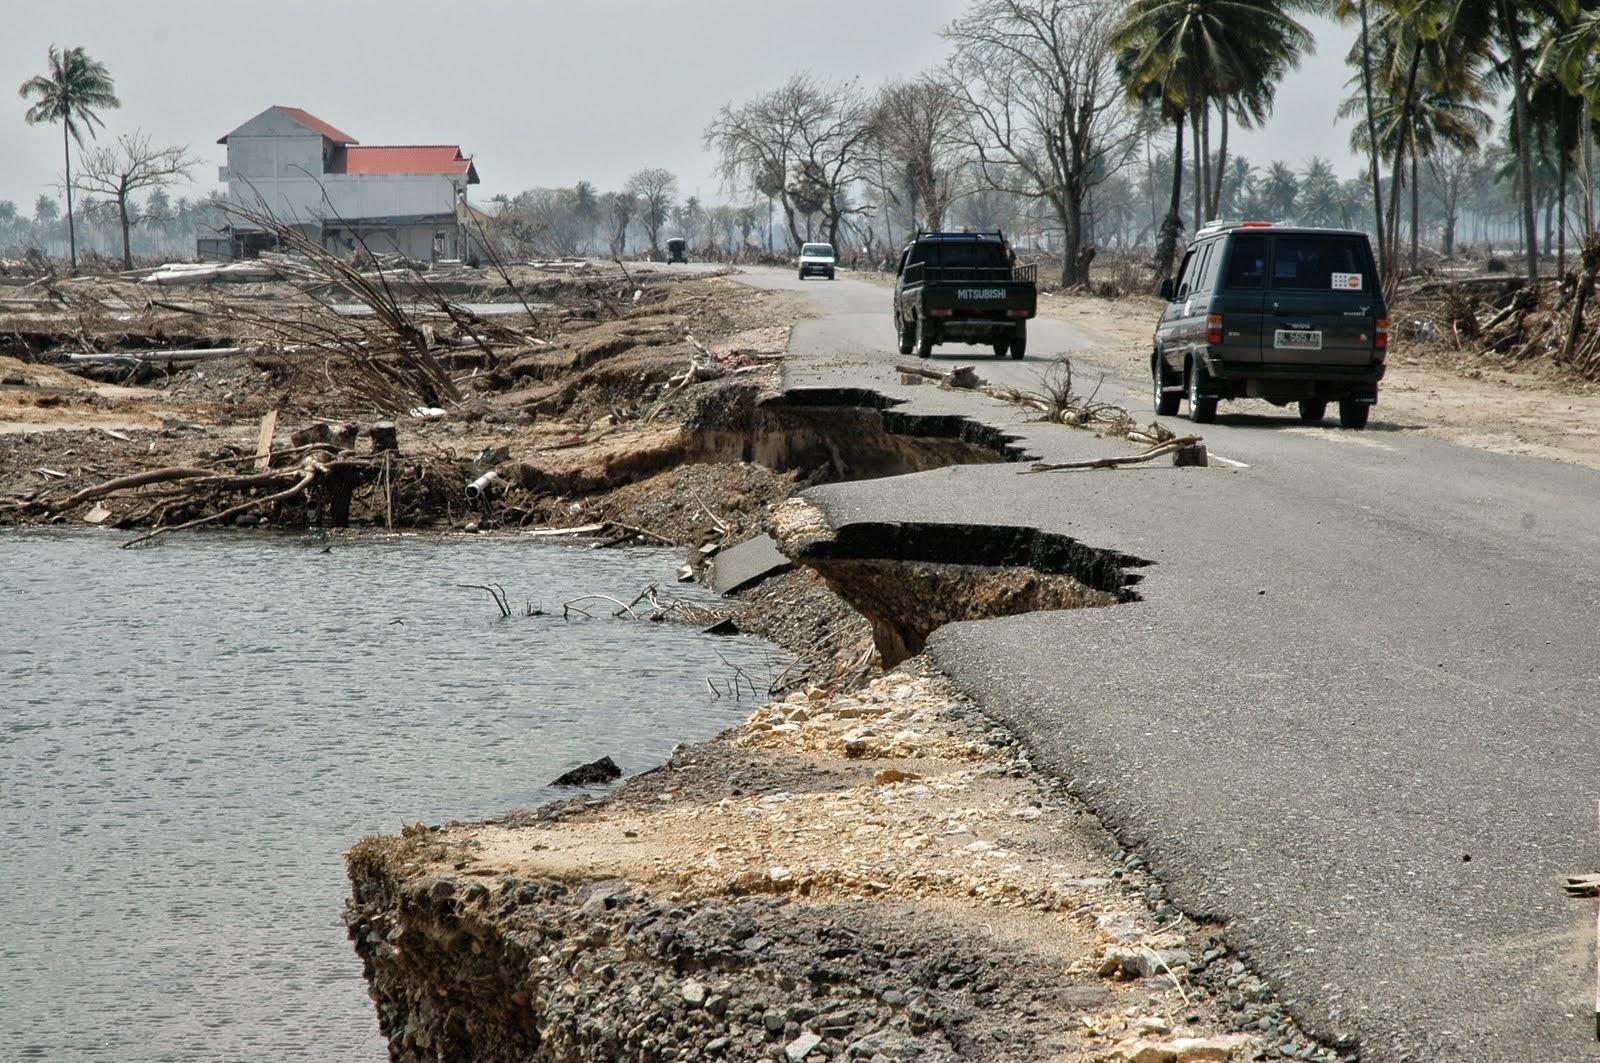 Jalan Laksamana Malahayati Tsunami 2004